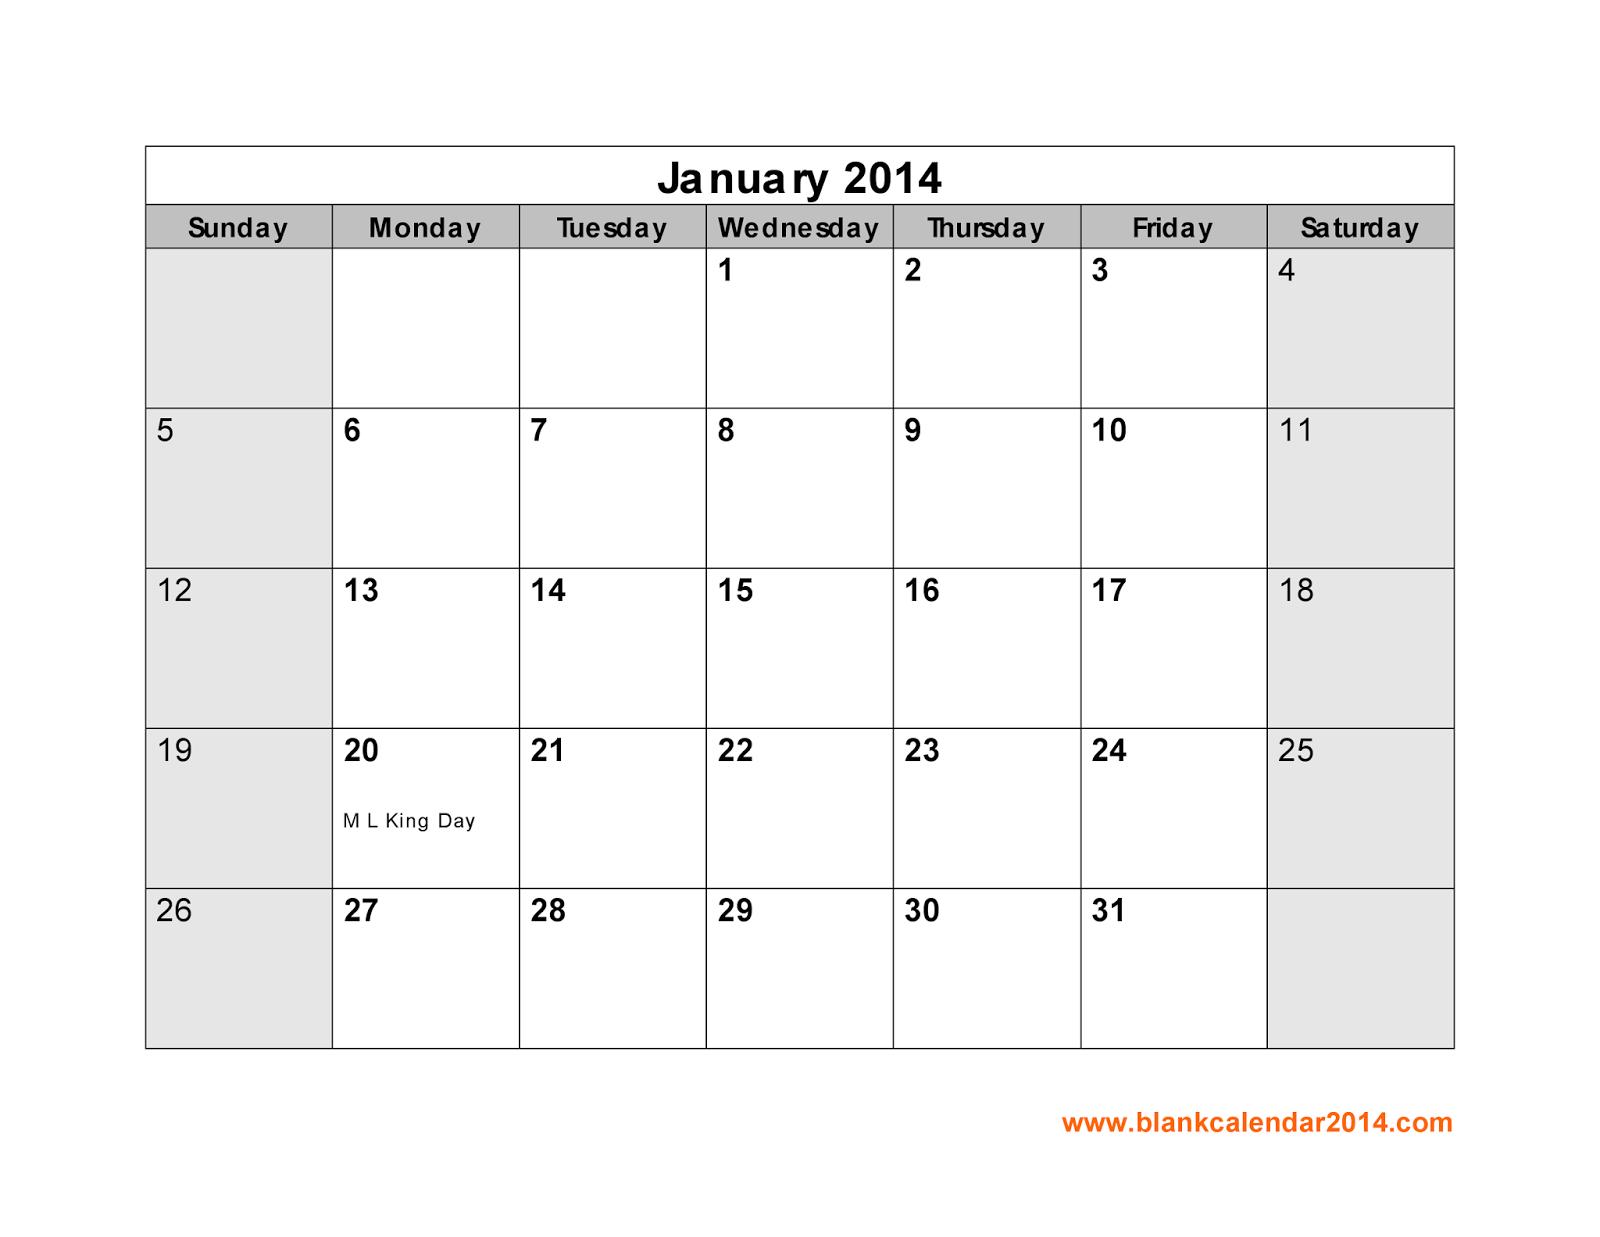 January 2014 calendar printable 15 printable calendar for 15 month calendar template